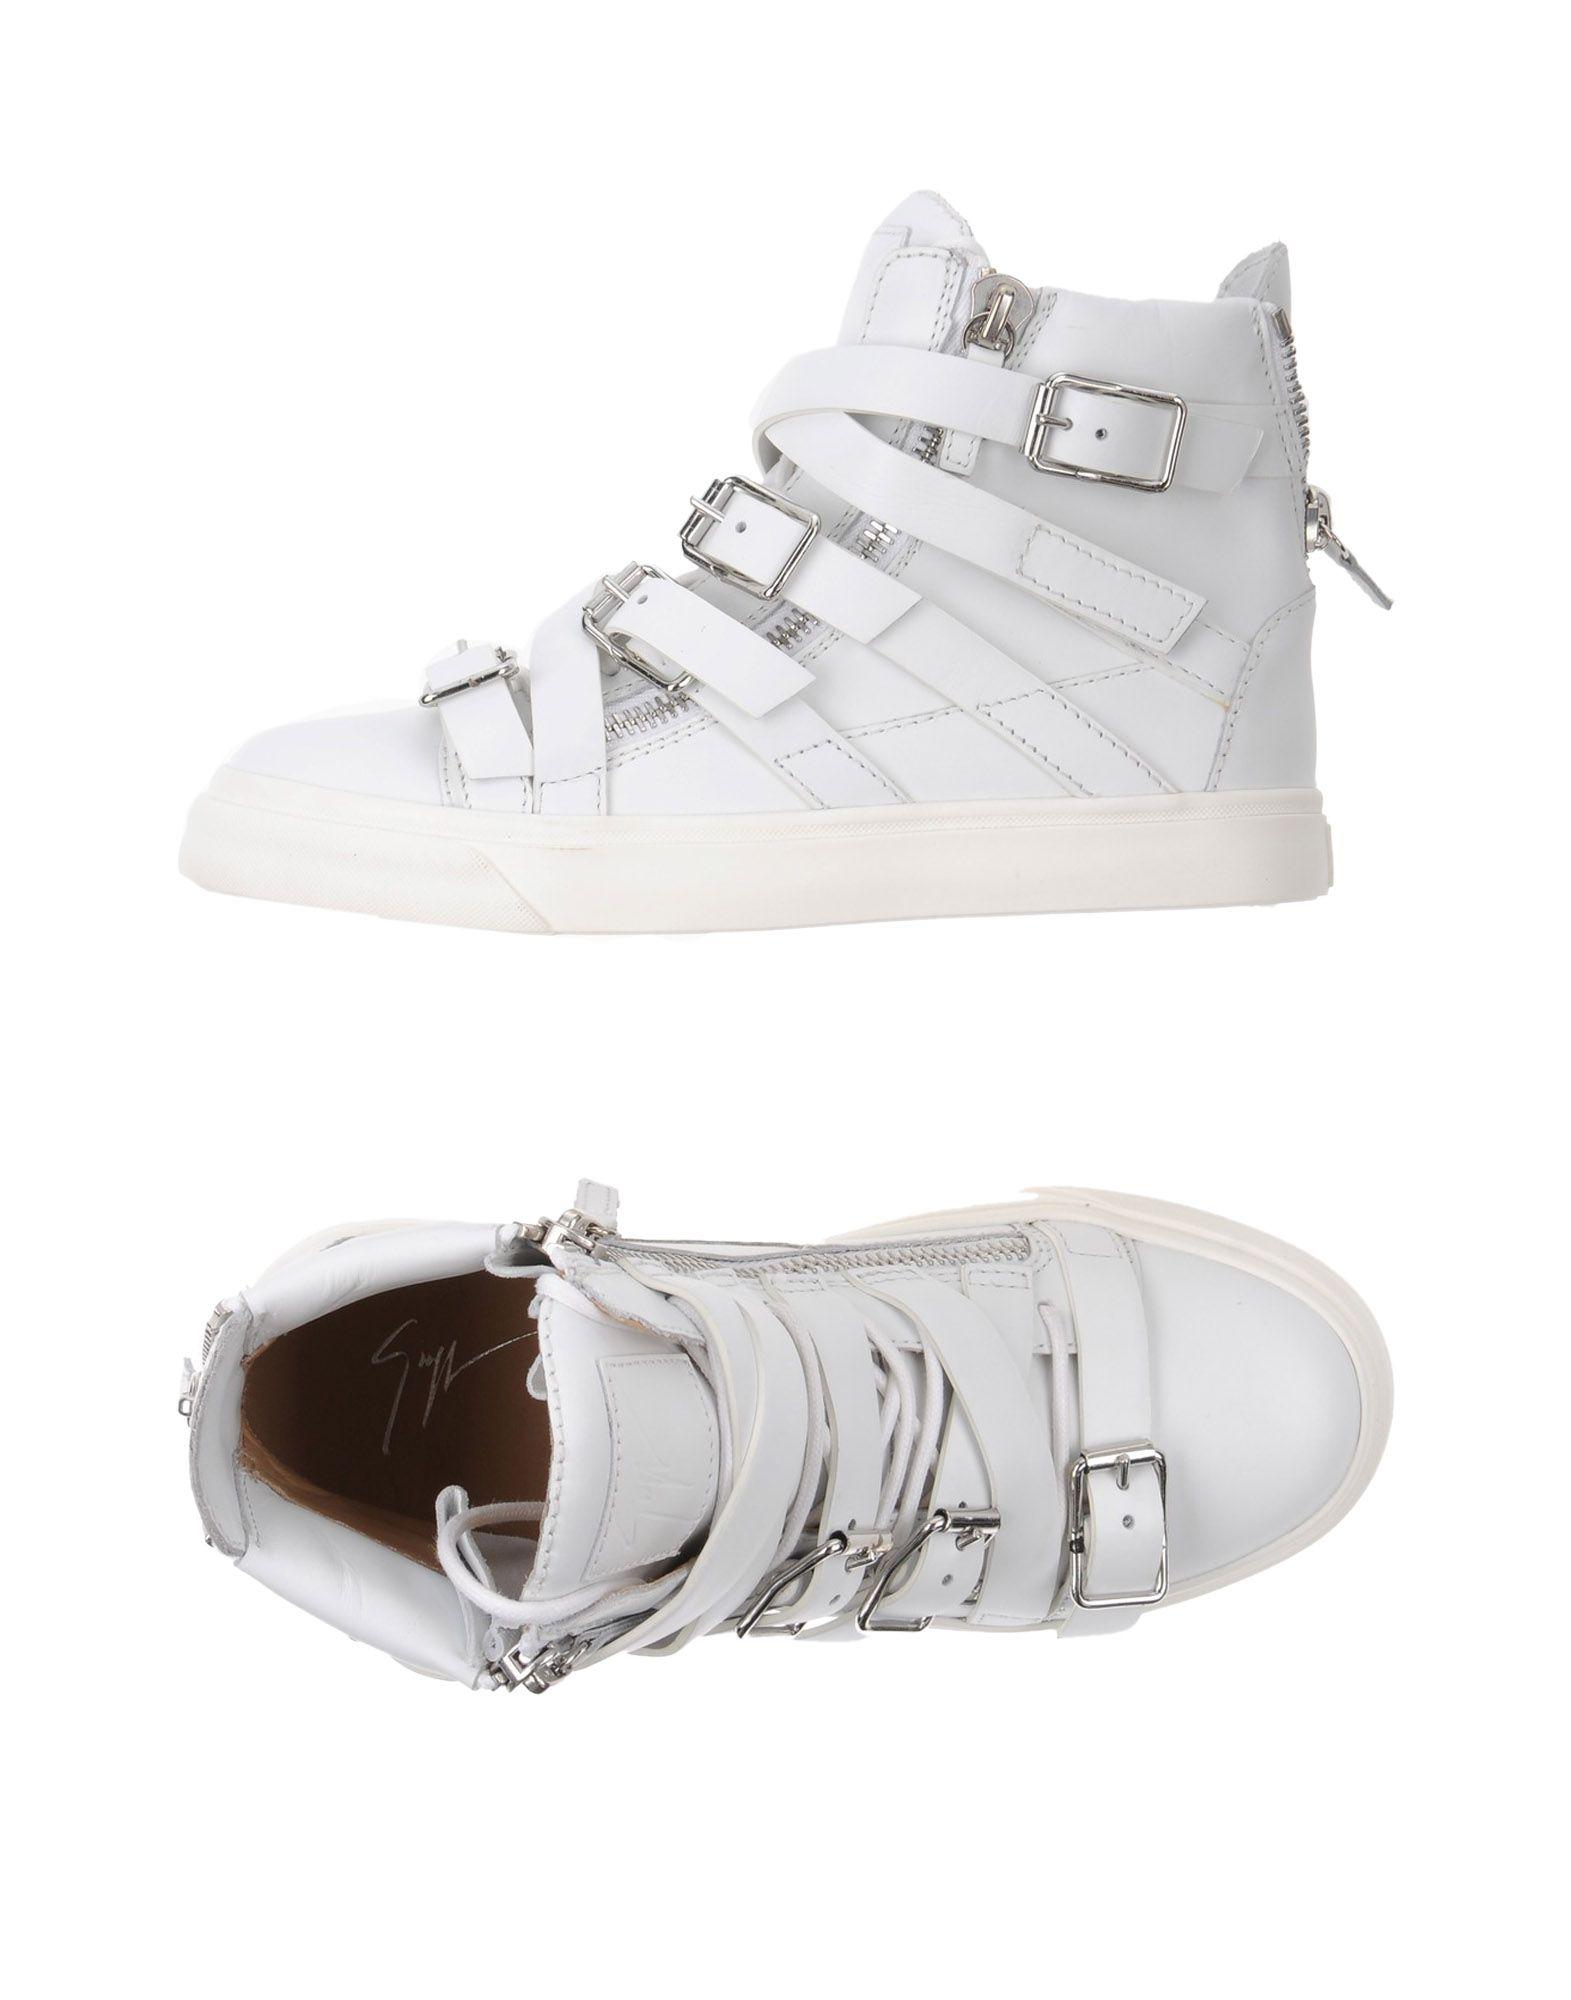 GIUSEPPE ZANOTTI DESIGN Damen High Sneakers & Tennisschuhe Farbe Weiß Größe 8